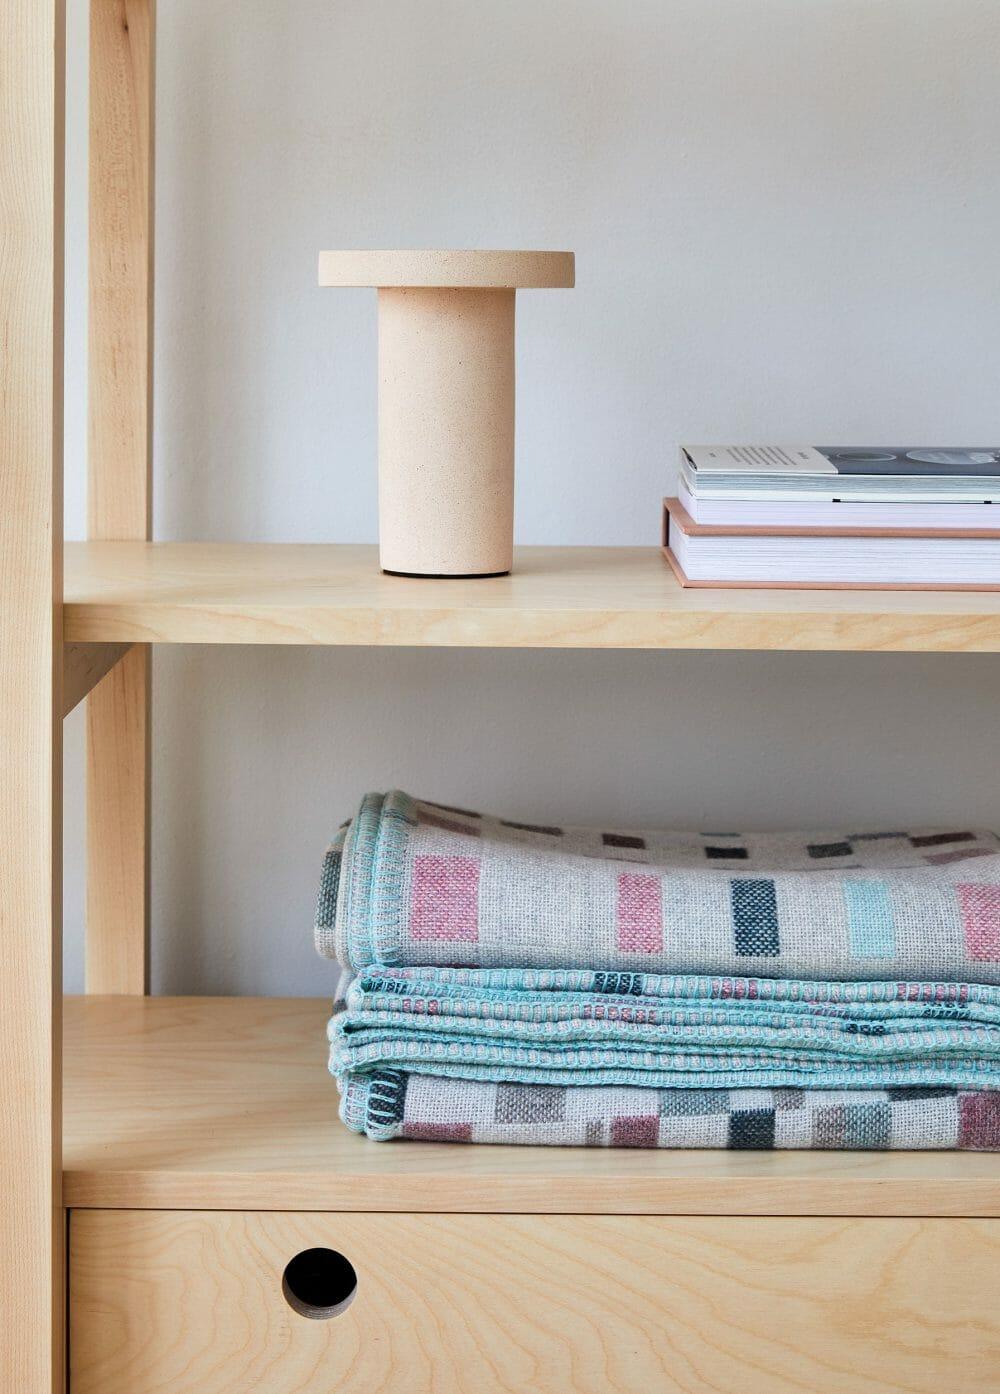 macaron-blanket-textiles-design-candleholder-books-shelving-furniture-design